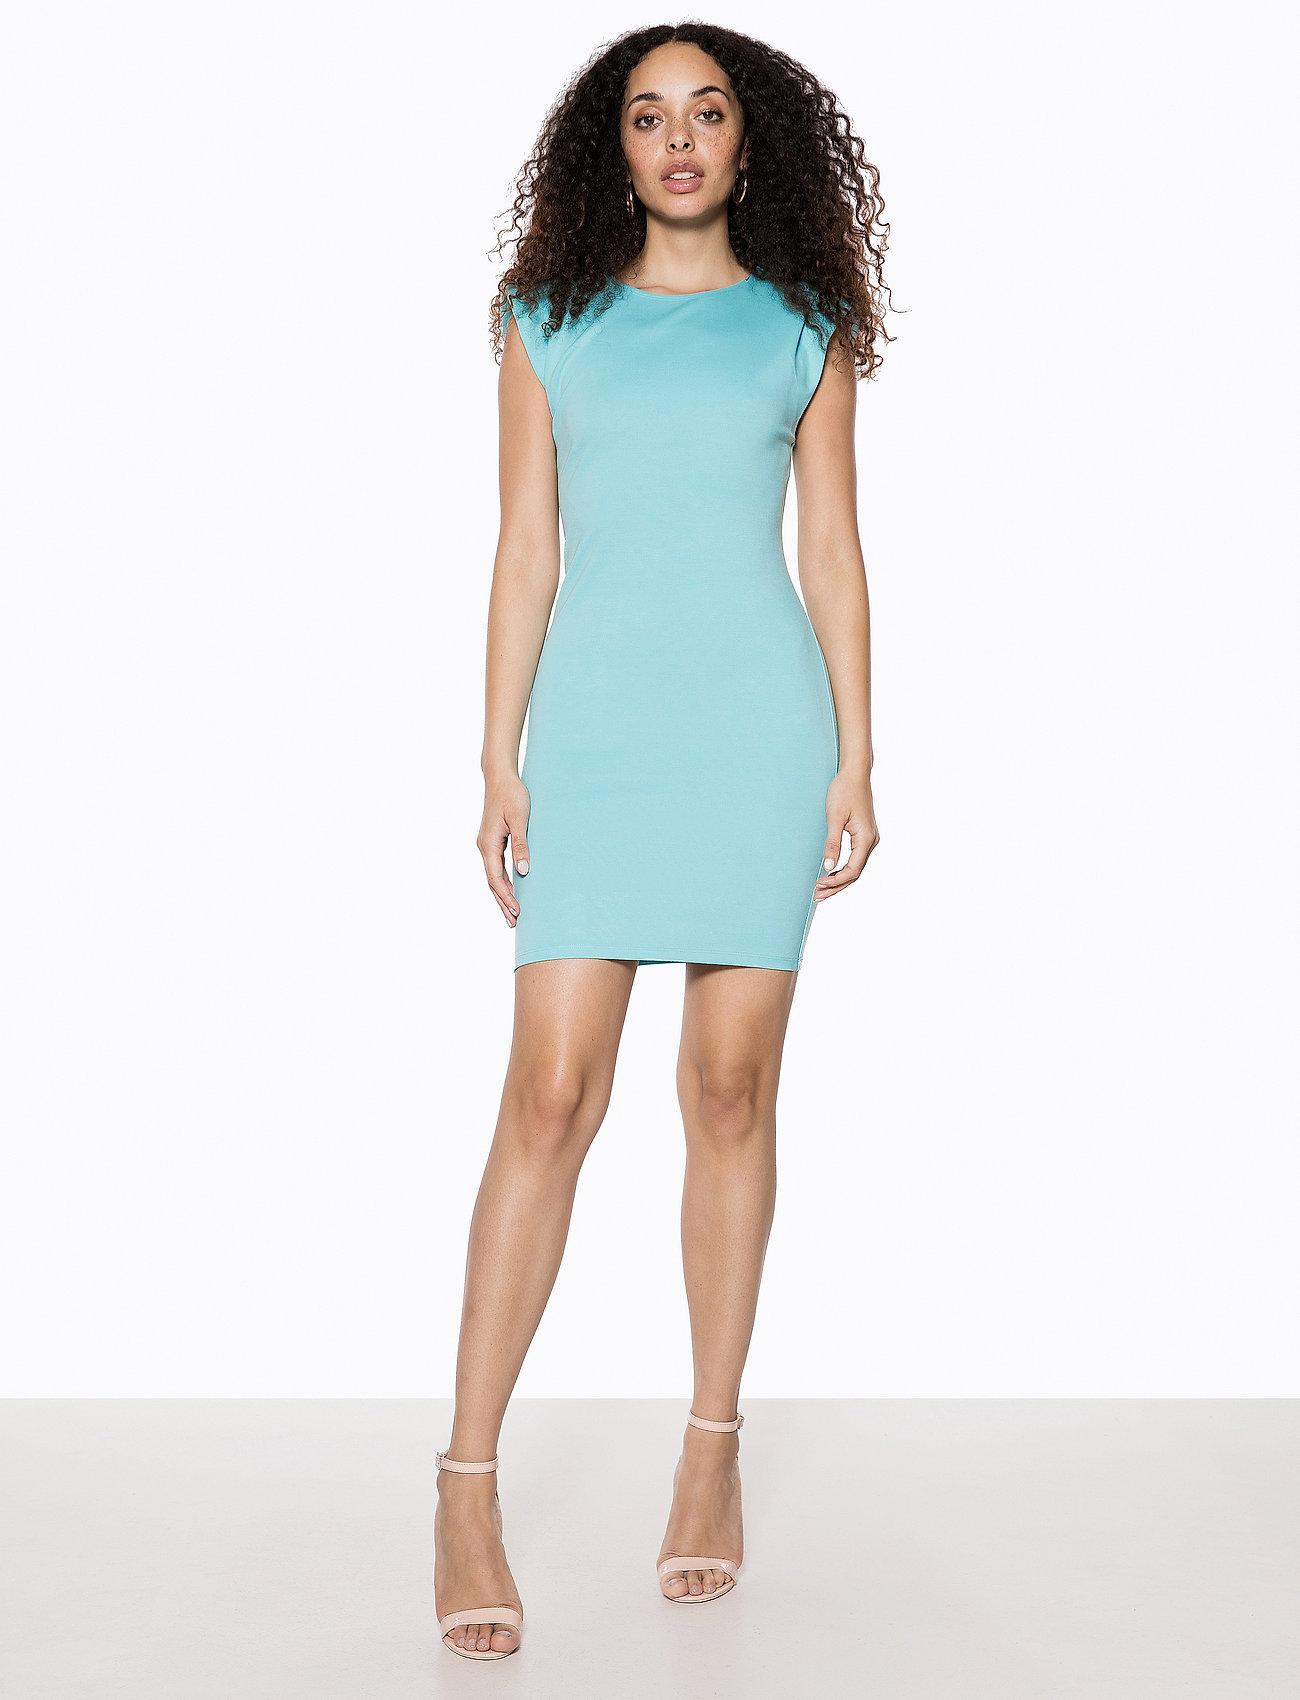 Pad Mini Shoulder Dresslight BlueIvyrevel CxrBodeW